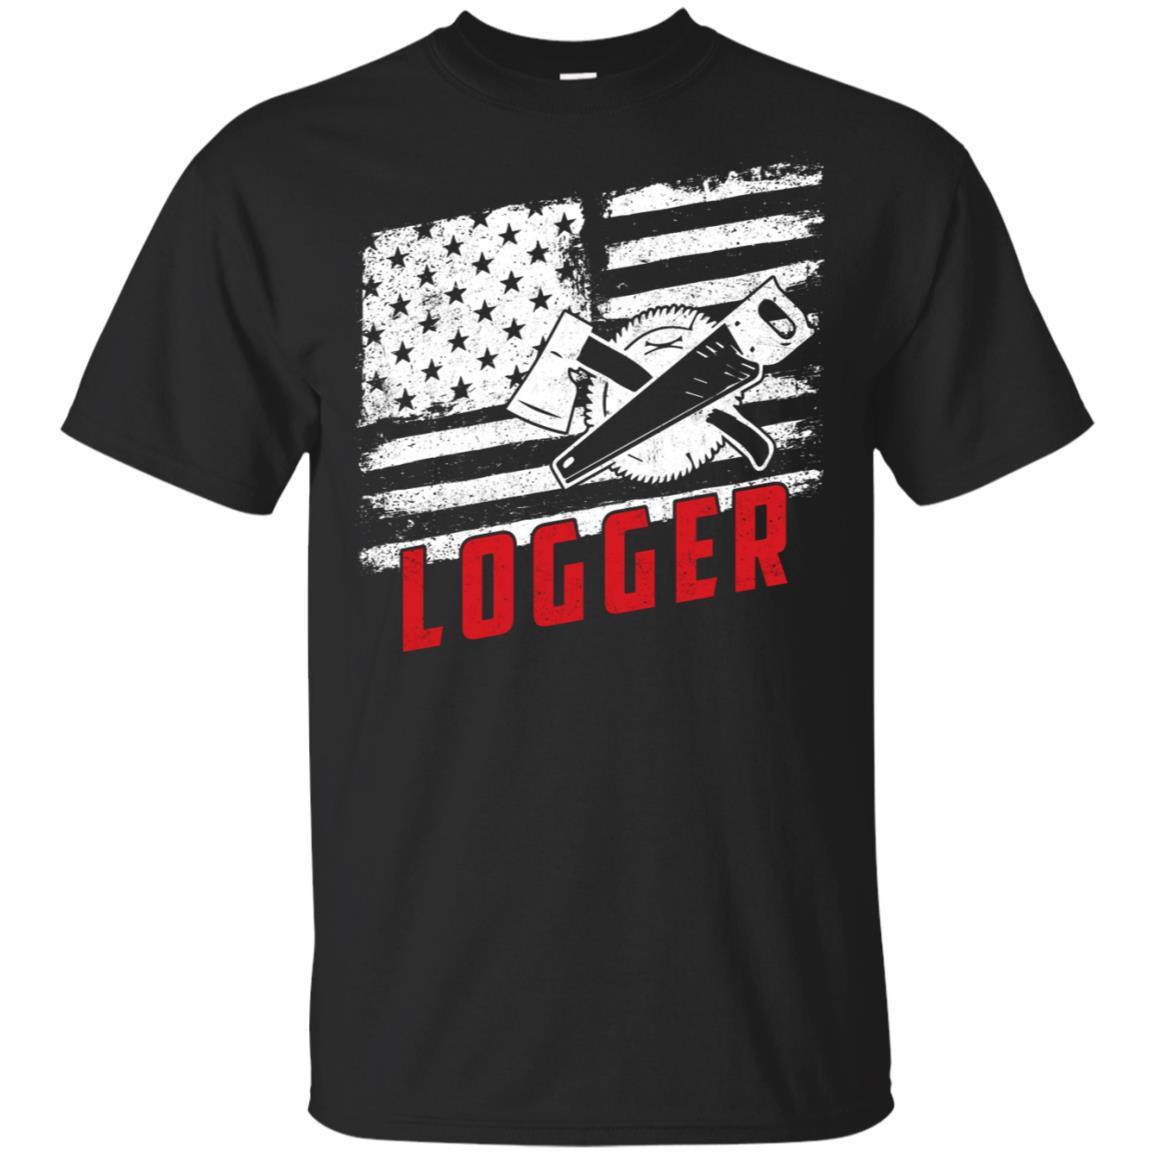 Vintage Logger American Flag Unisex Short Sleeve